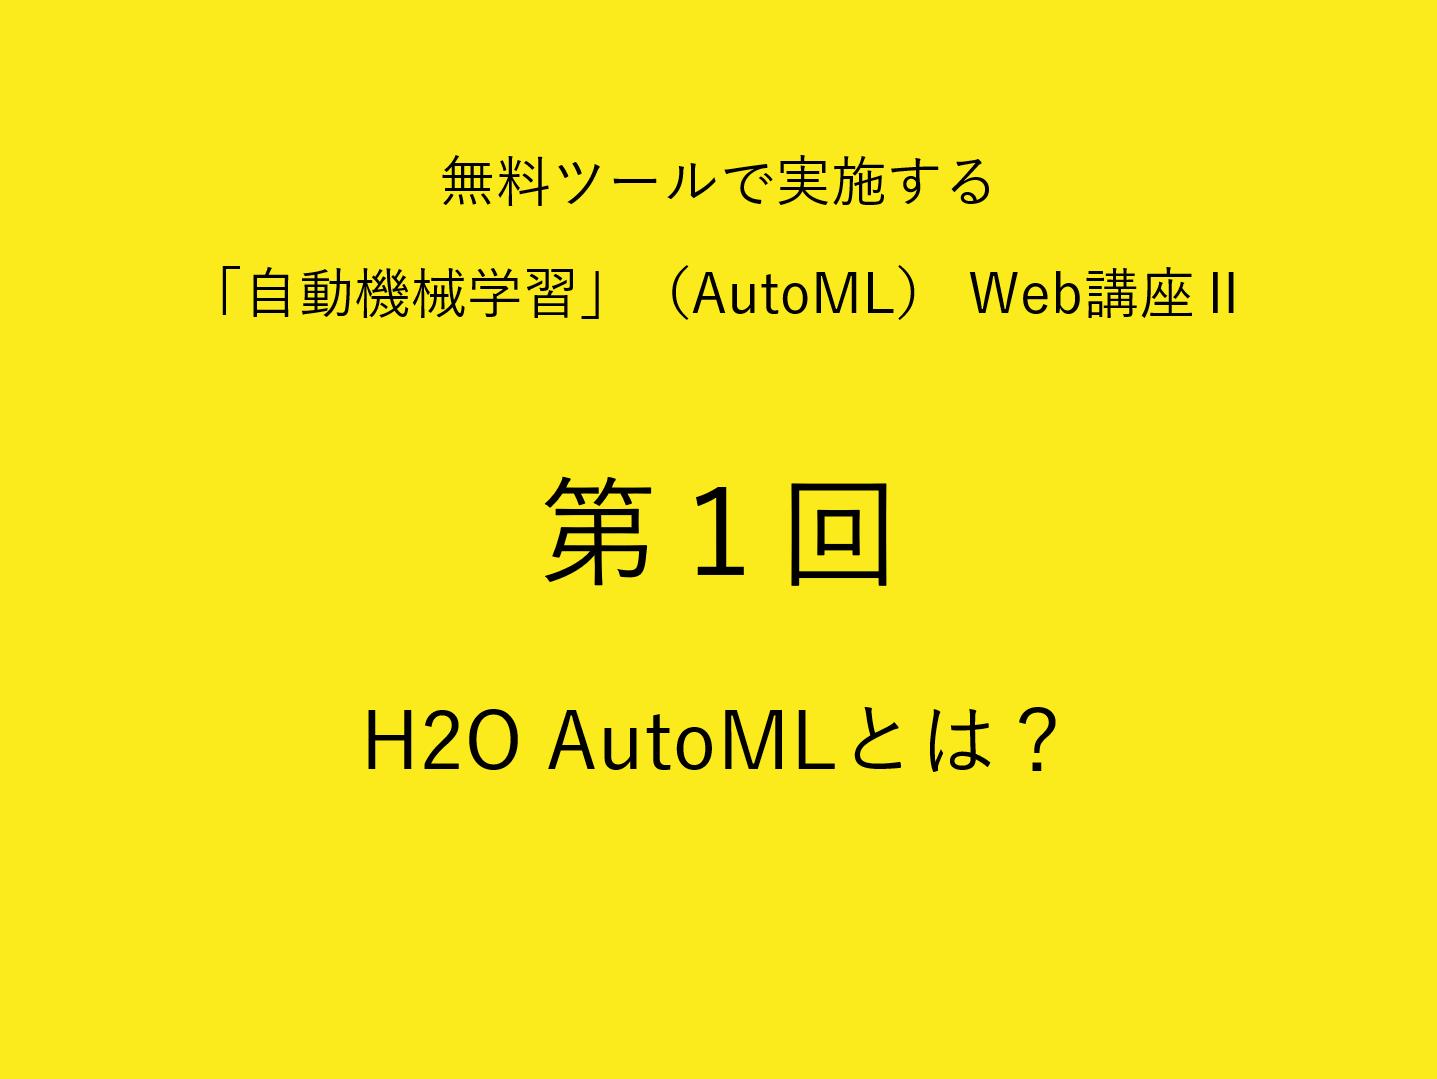 H2O AutoML とは?